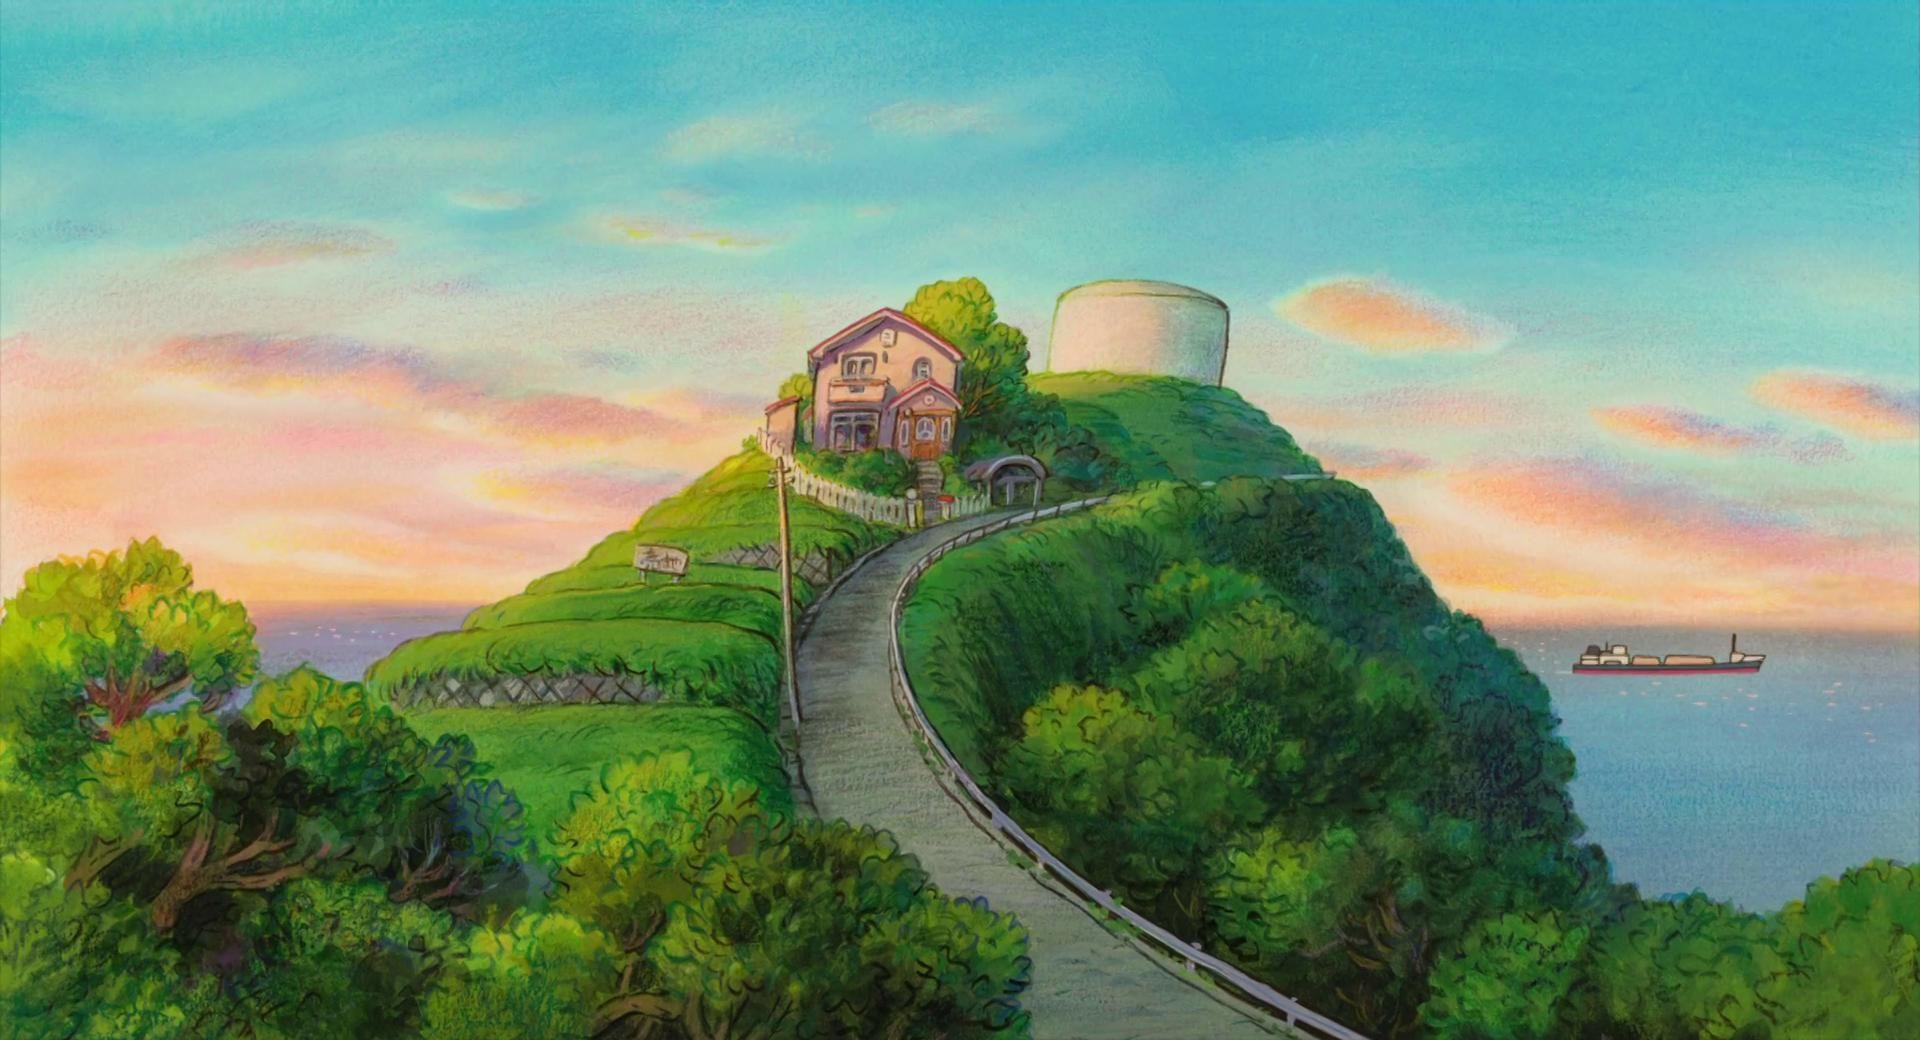 Anime Landscapes Wallpaper | 1920x1040 | ID:46549 | Ghibli ...